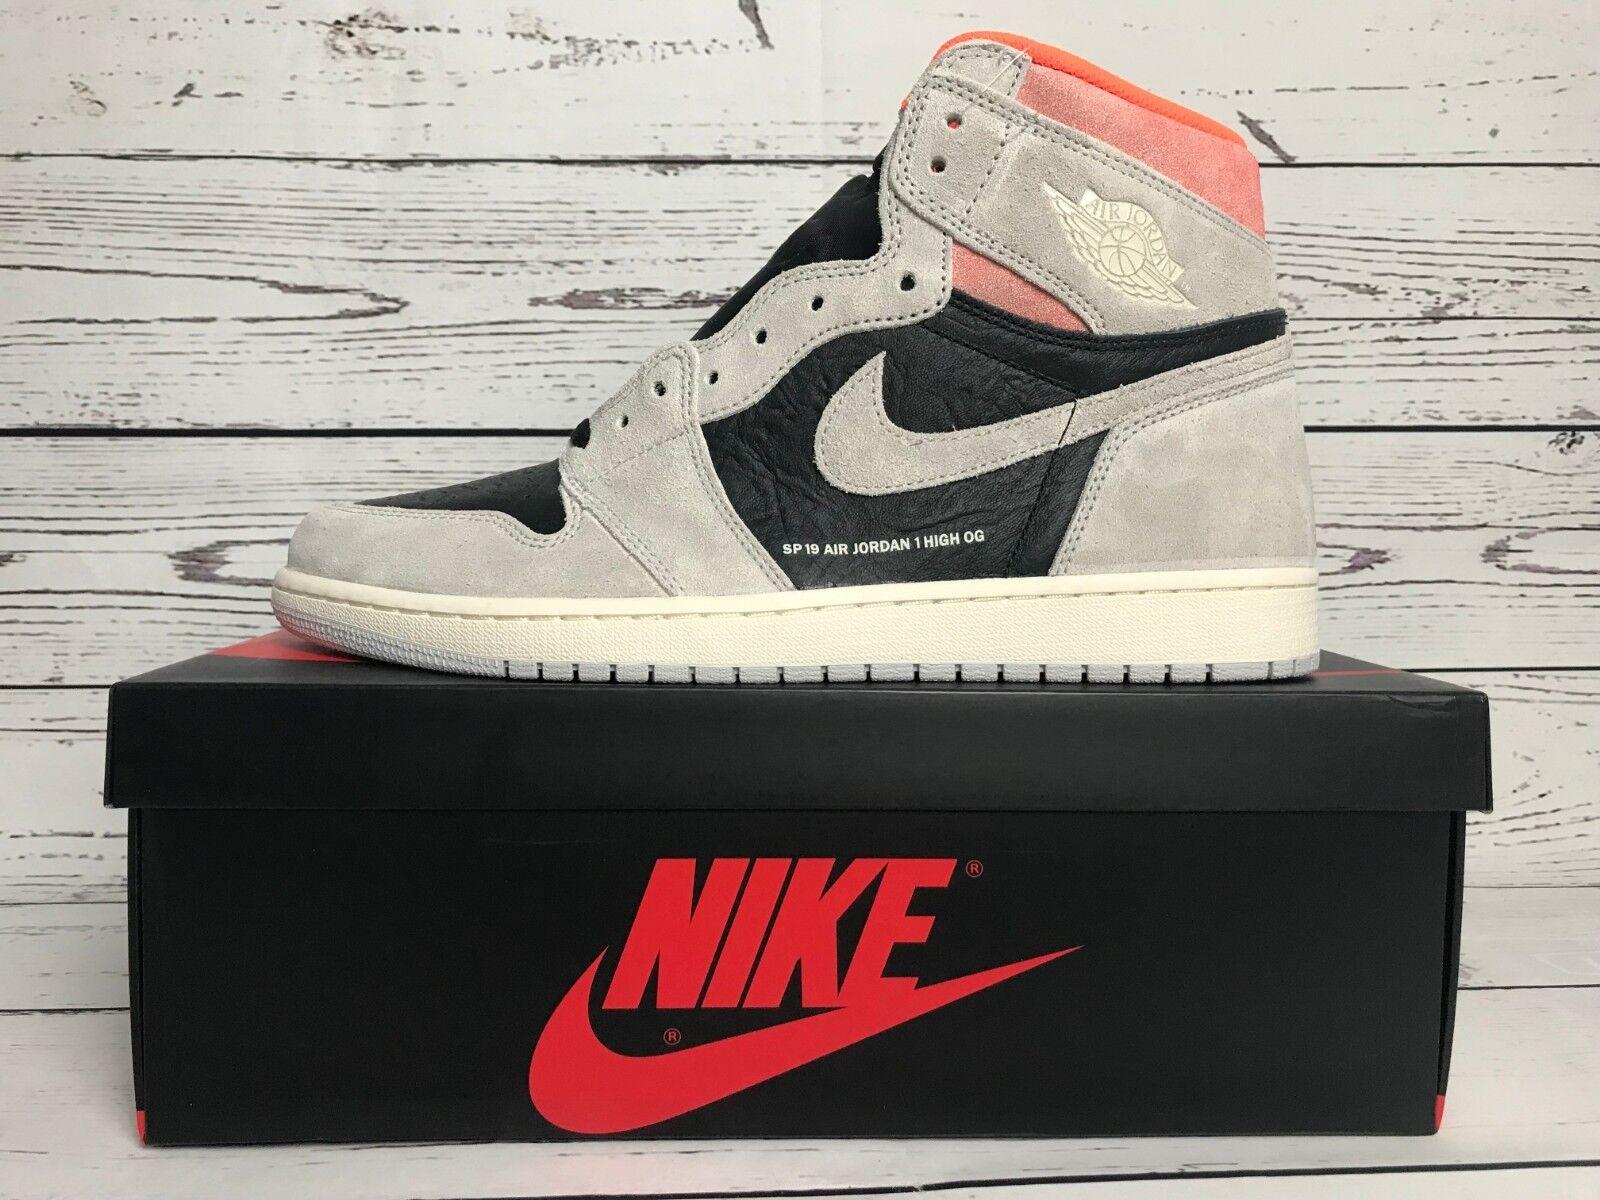 NIB Air Jordan 1 Retro High OG  Neutral grau 555088-018 Größe 13 w receipt